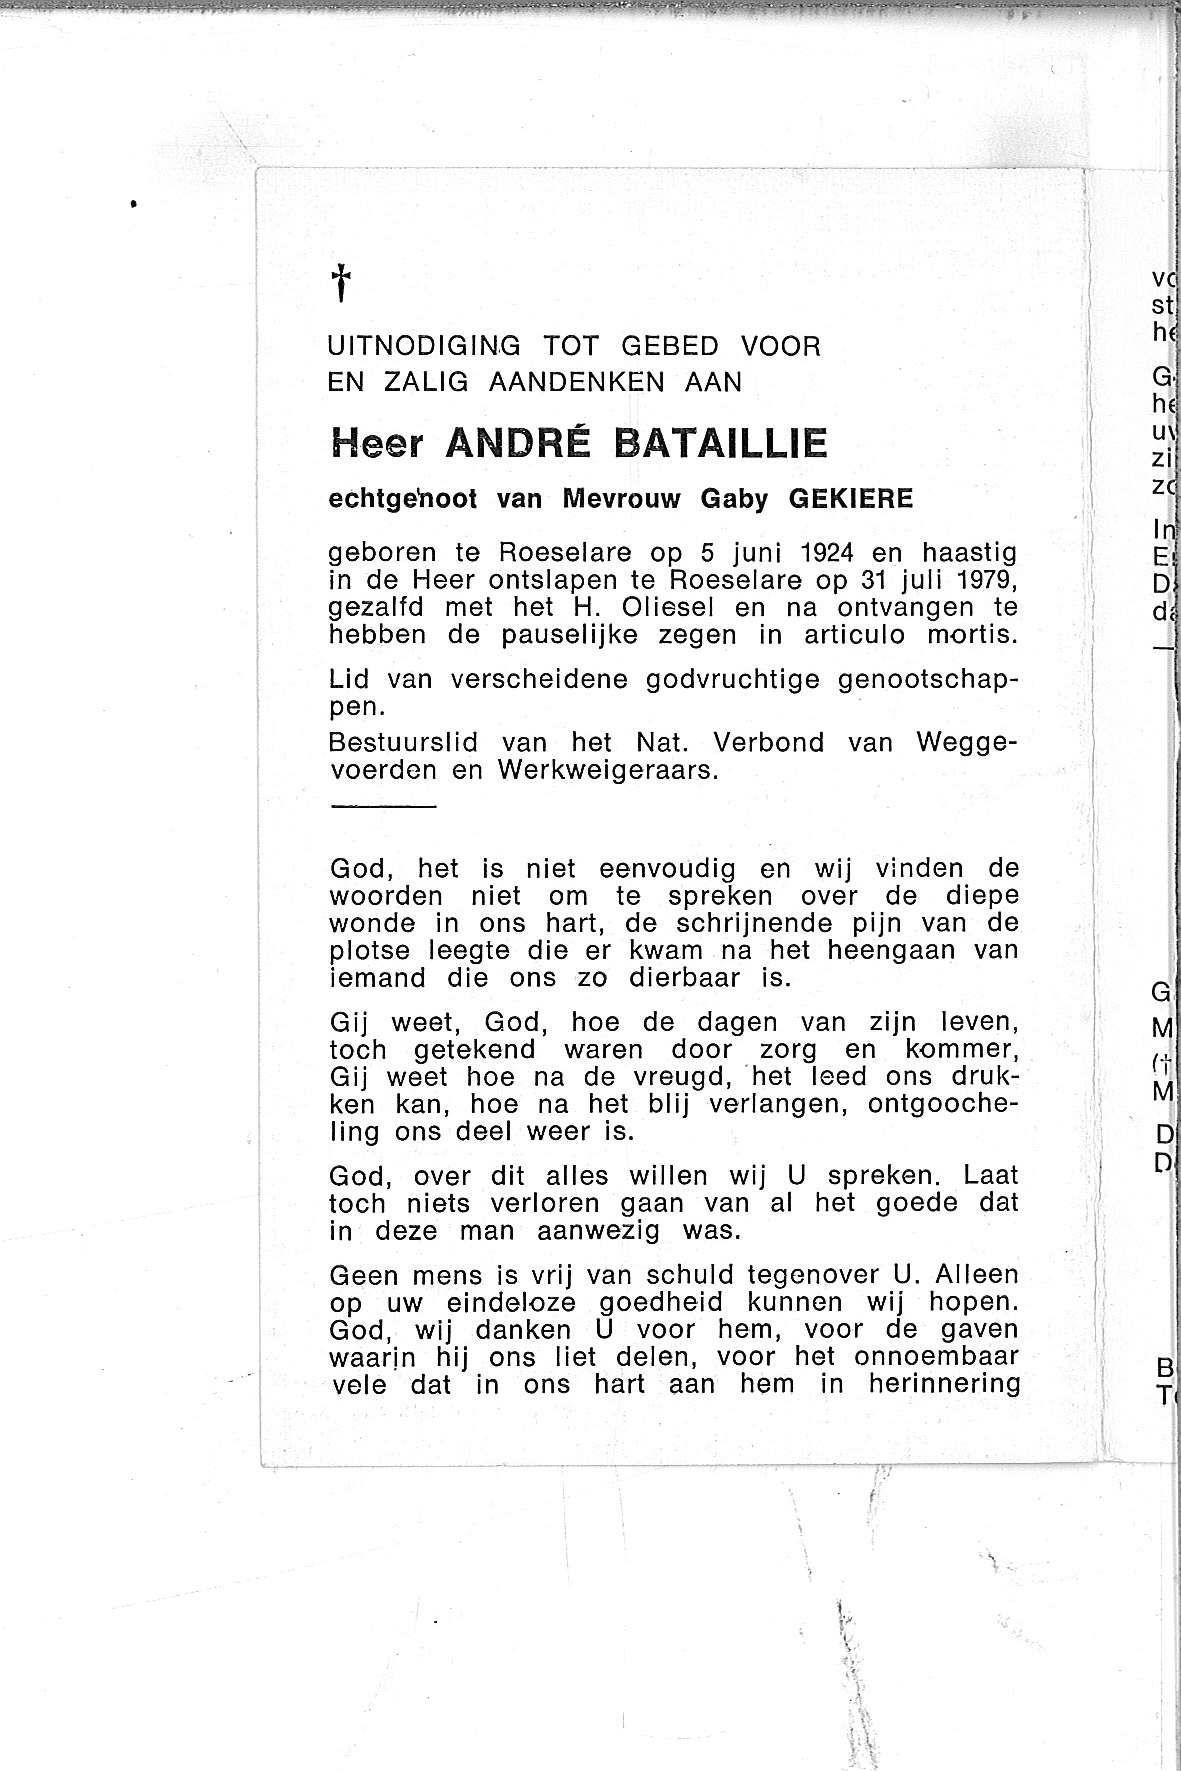 André(1979)20130828105443_00062.jpg